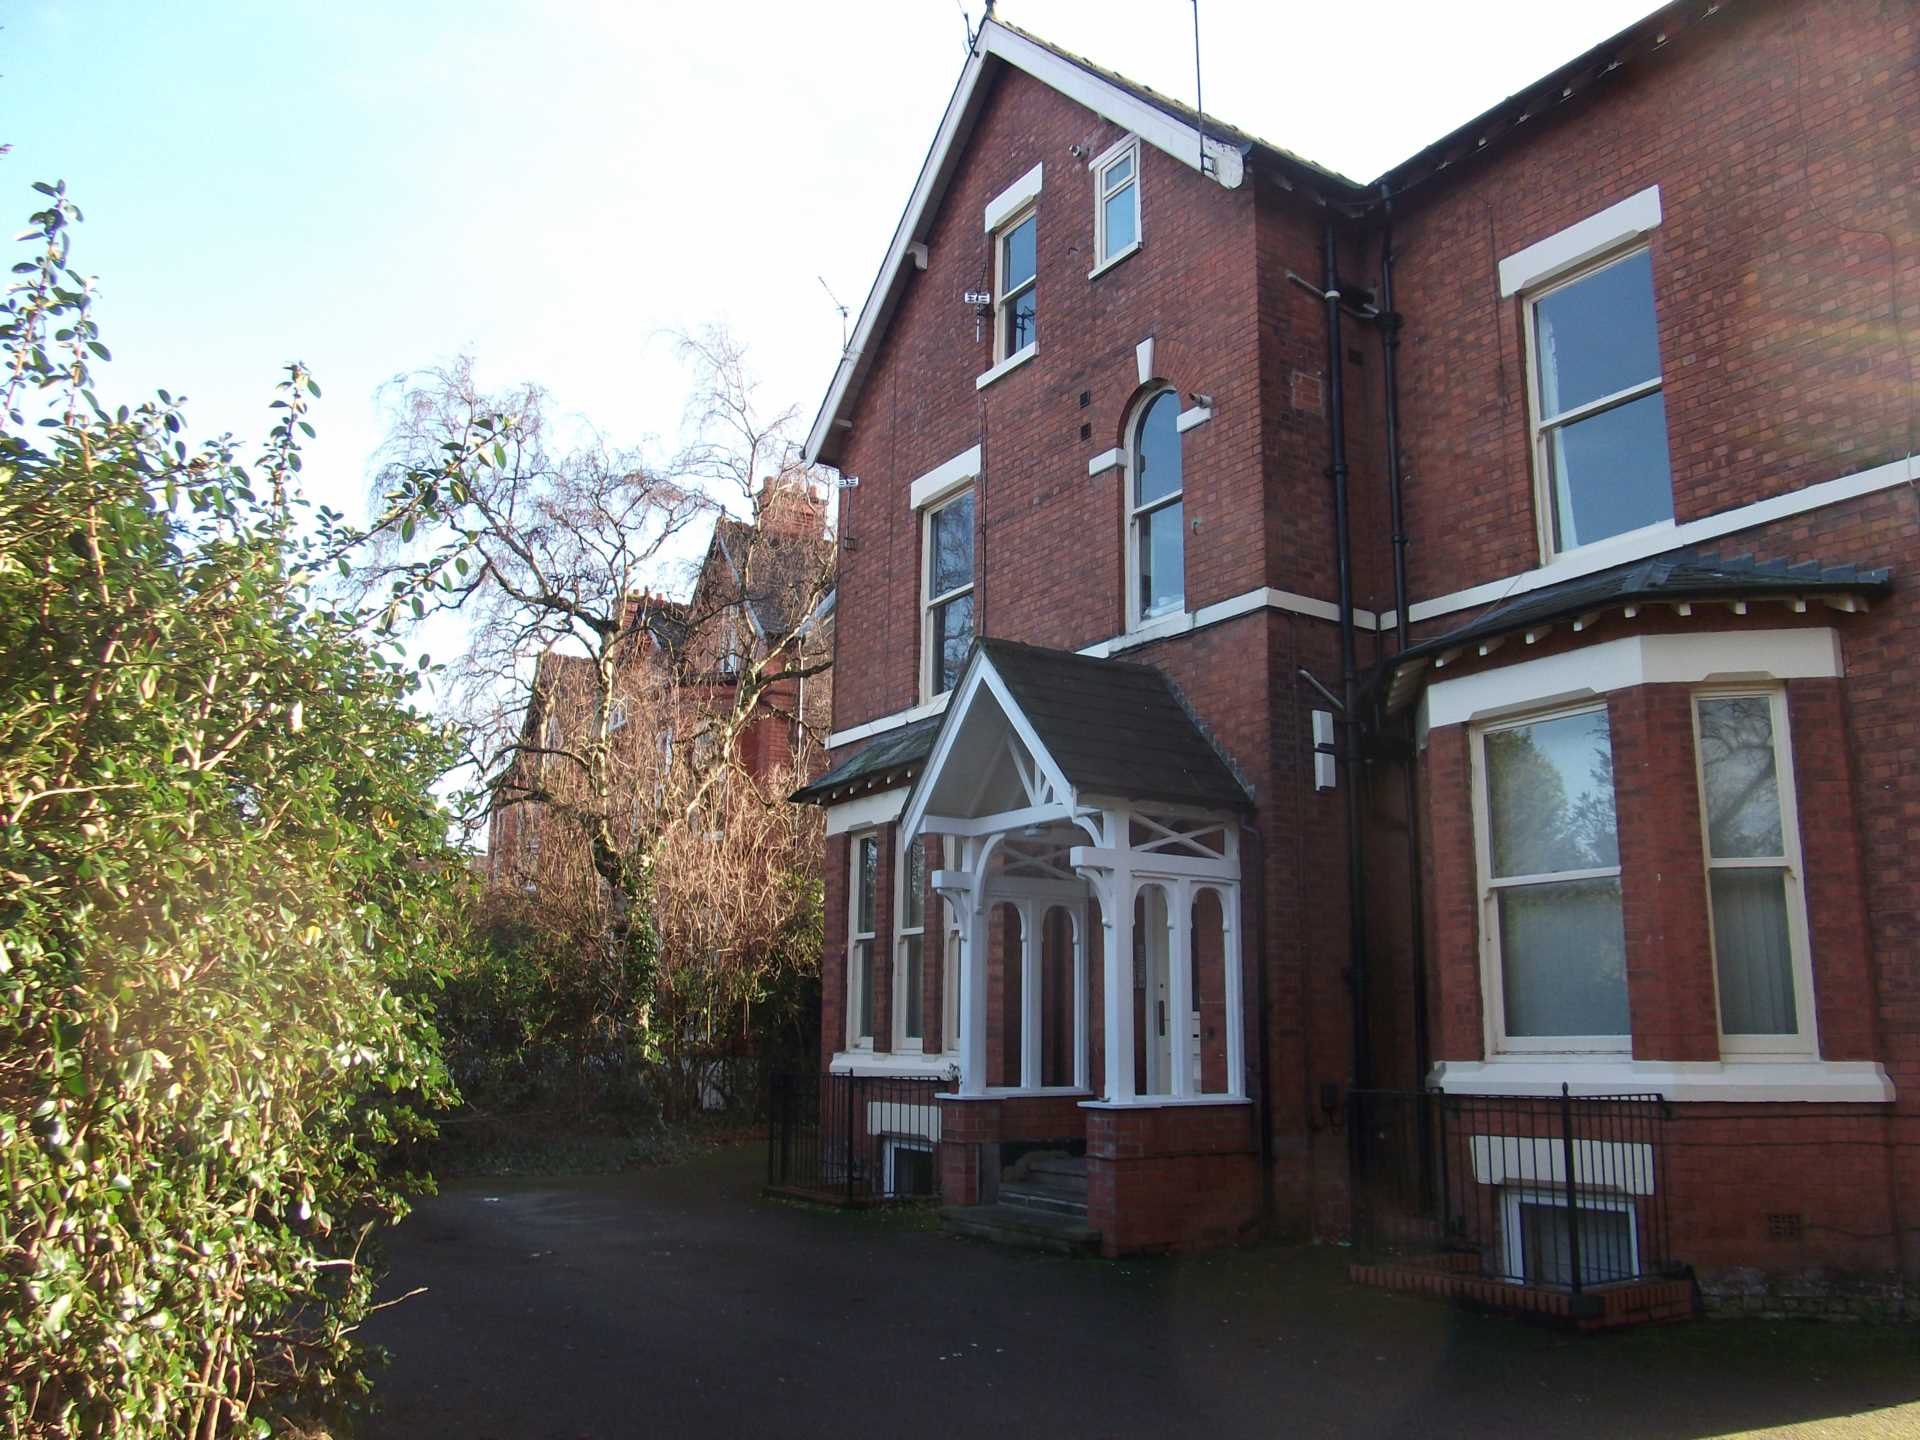 Piccadilly Property Management Ltd - 1 Bedroom Apartment, Northenden Road, Sale, M33 3HA